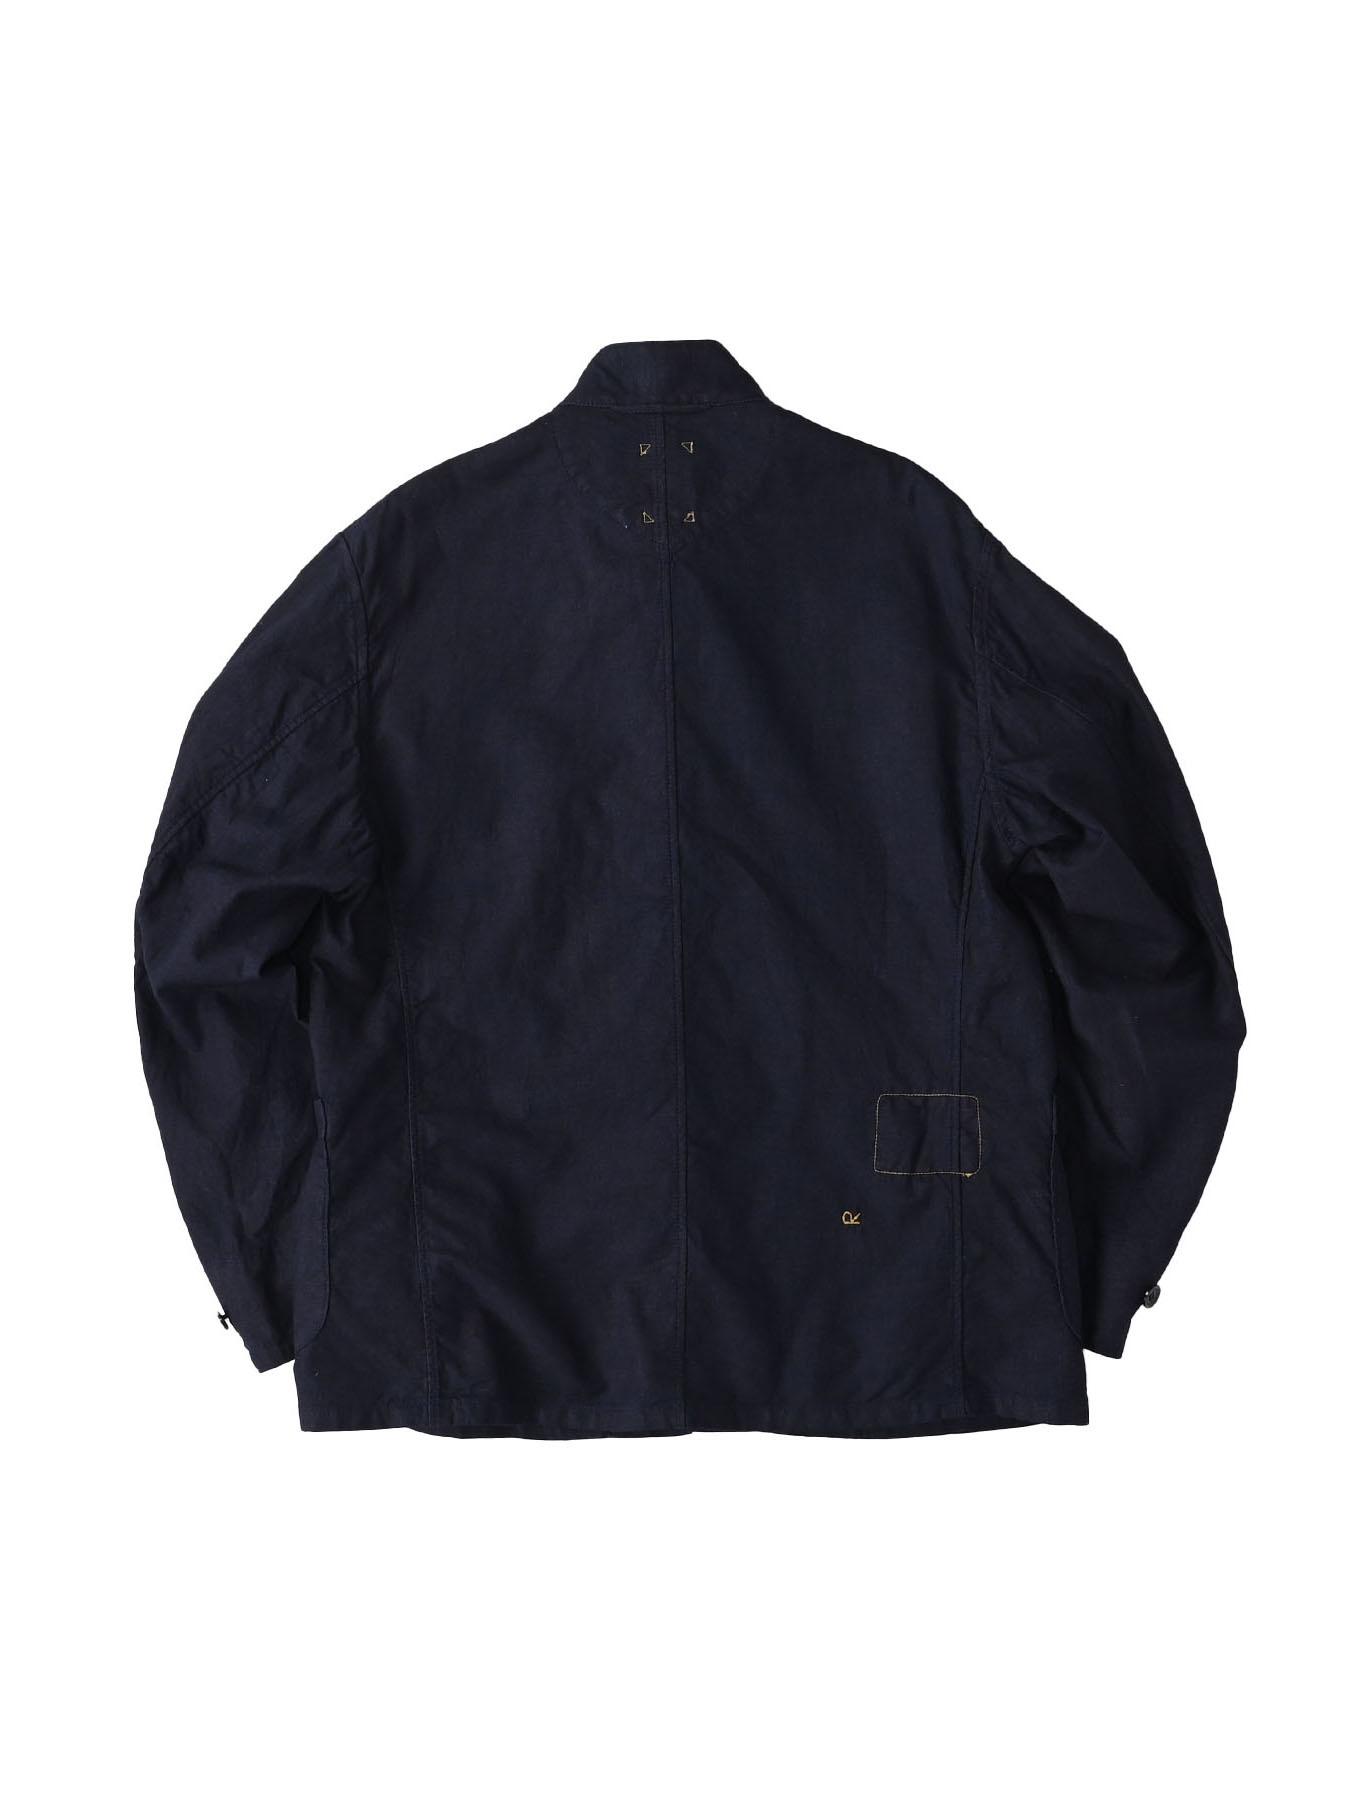 Indigo Double Woven 908 Shirt Jacket (0421)-6